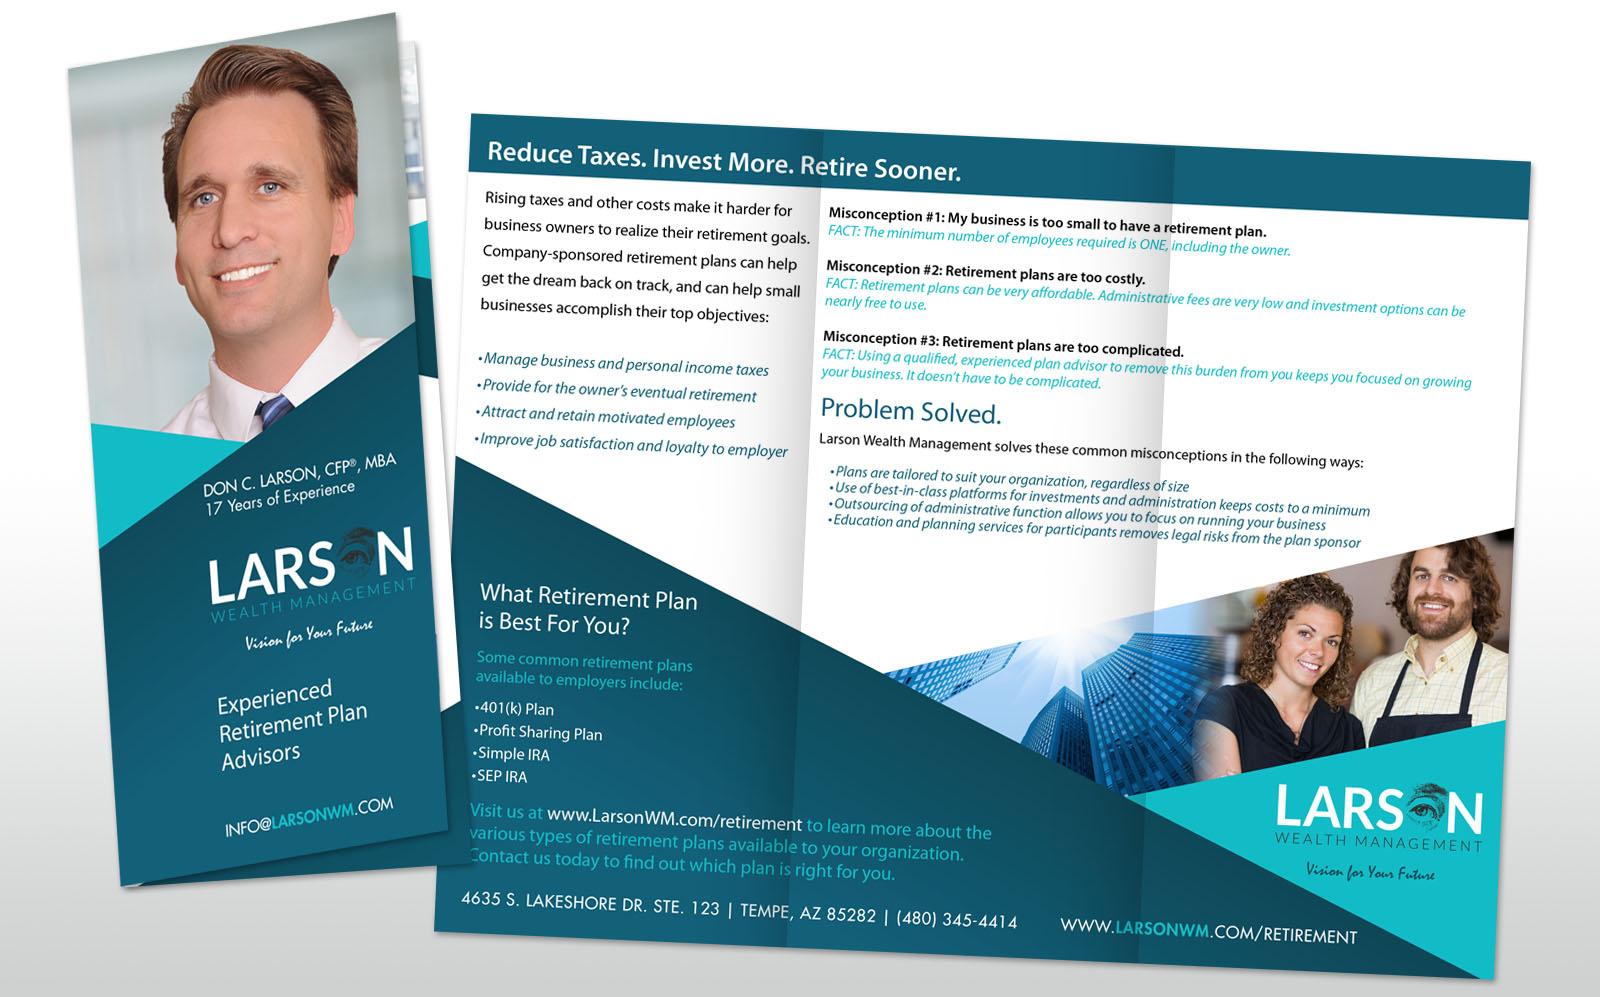 larson trifold brochure